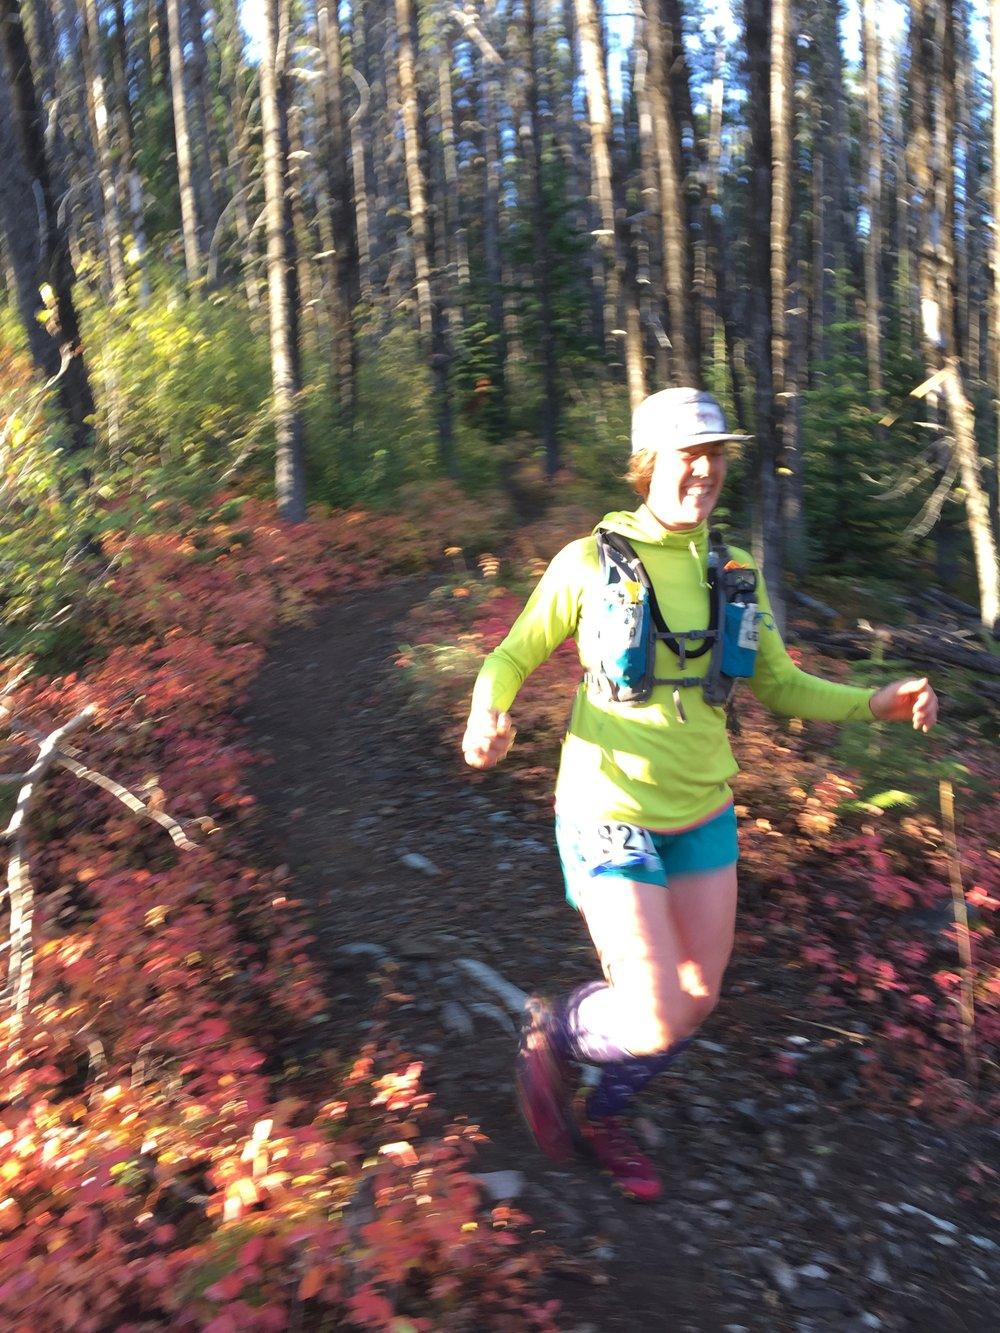 foys to blacktail trails trail marathon ftbtIMG_1044.JPG